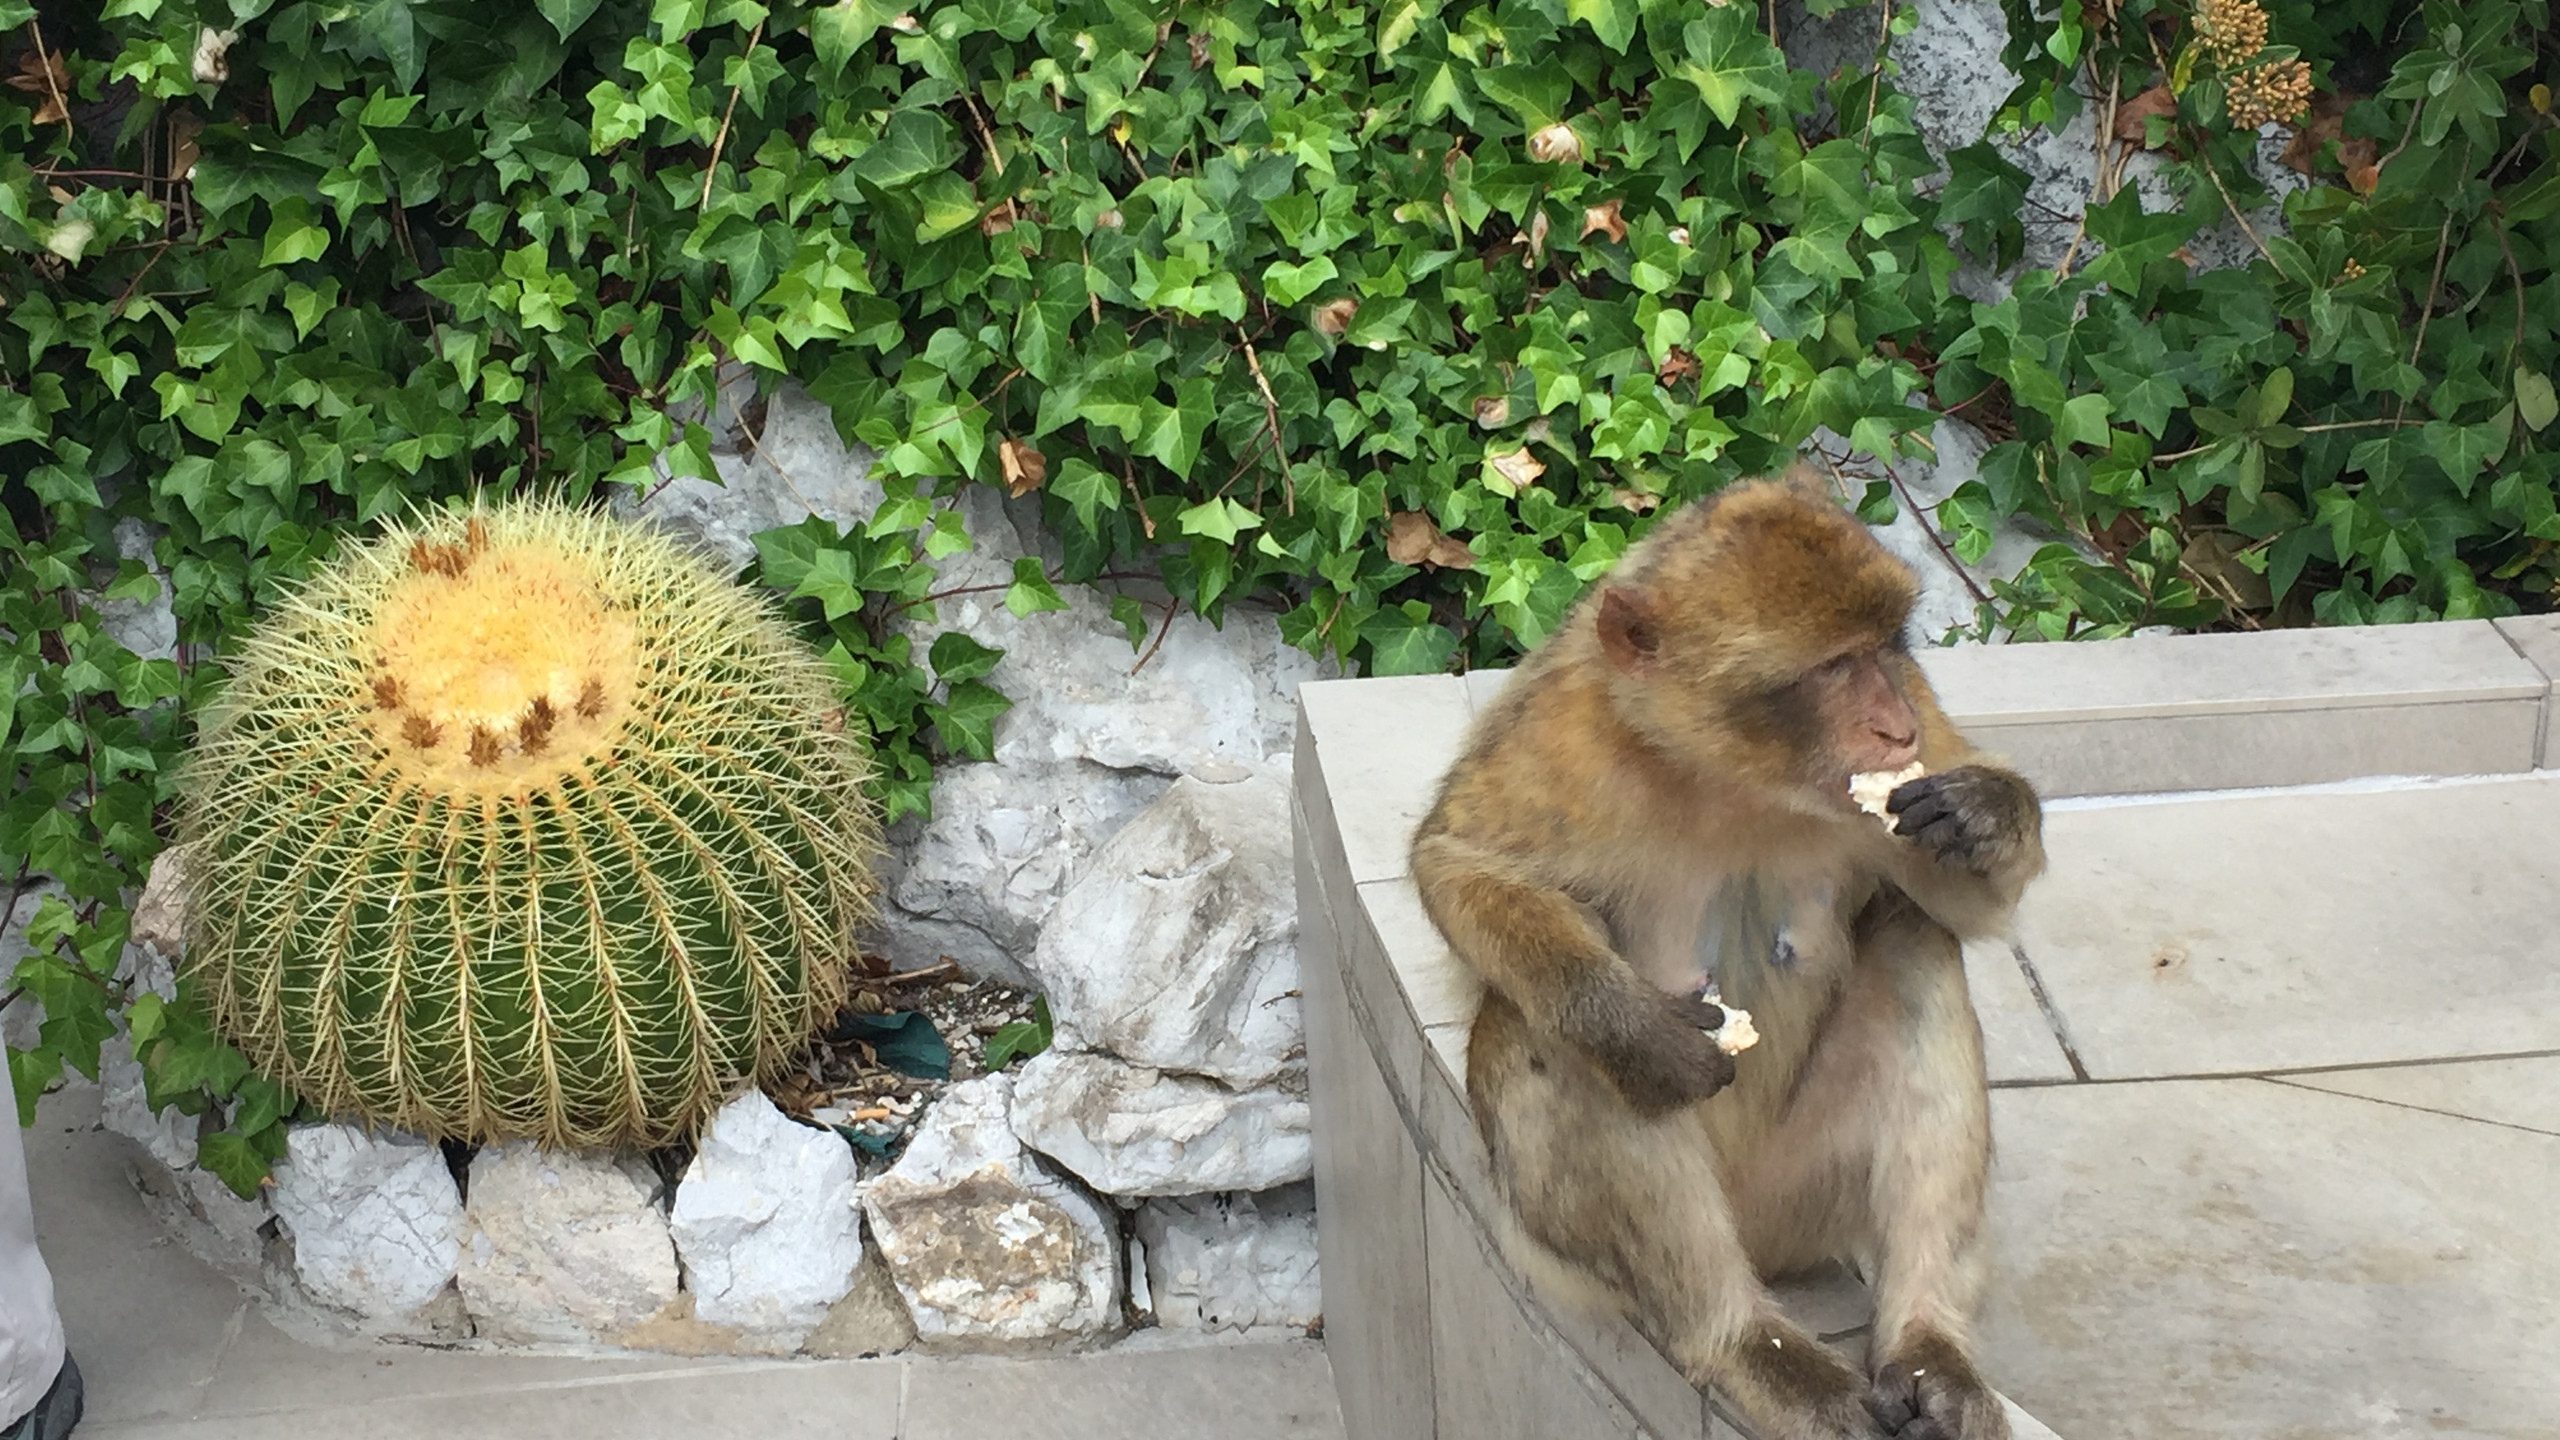 Monkey & Cactus